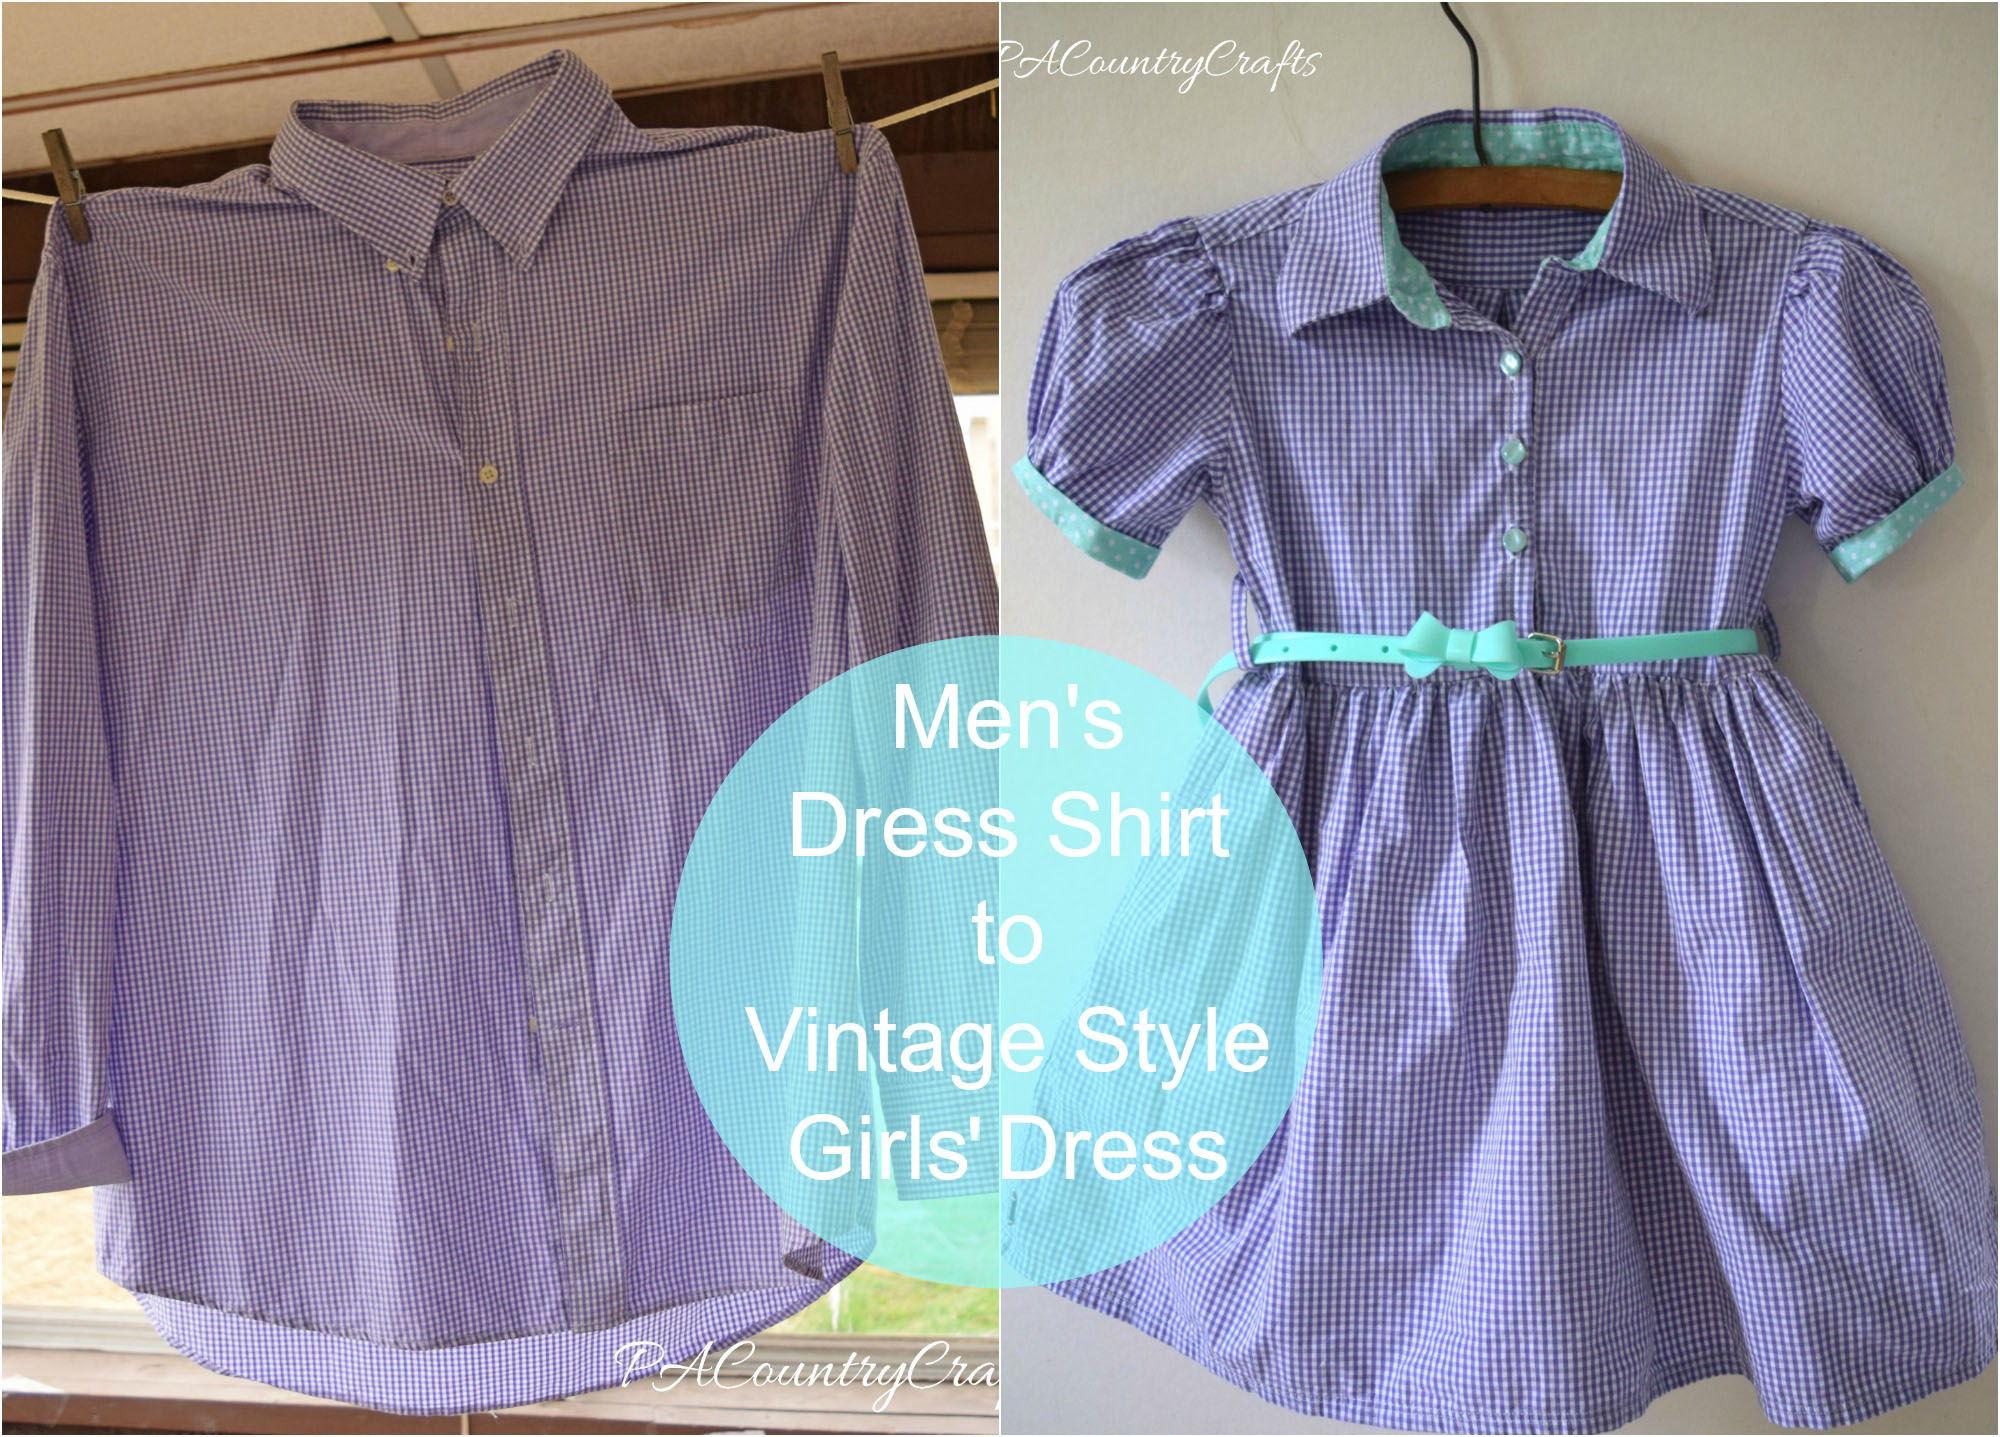 15+ Creative Ways To Repurpose Men's Shirt Into Little Girl's Dress -- Men's Dress Shirt to Girls' Vintage Style Dress